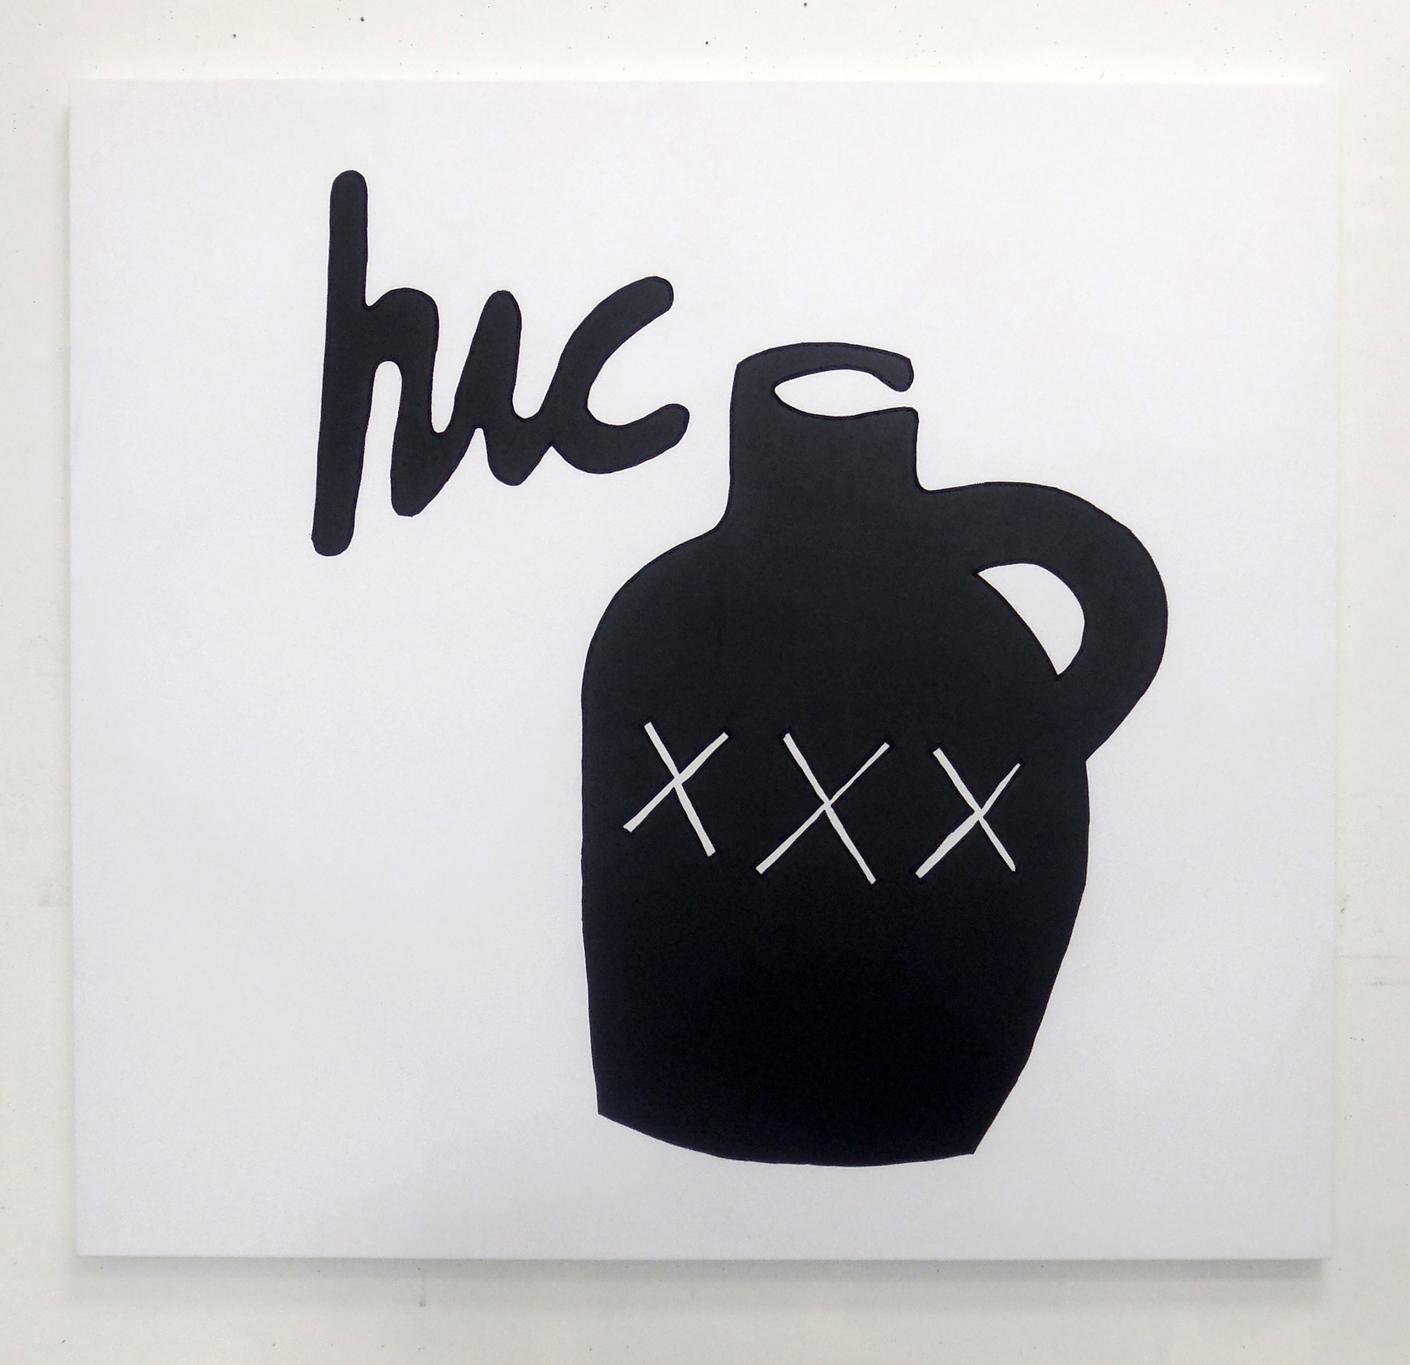 hic Drawing 2015